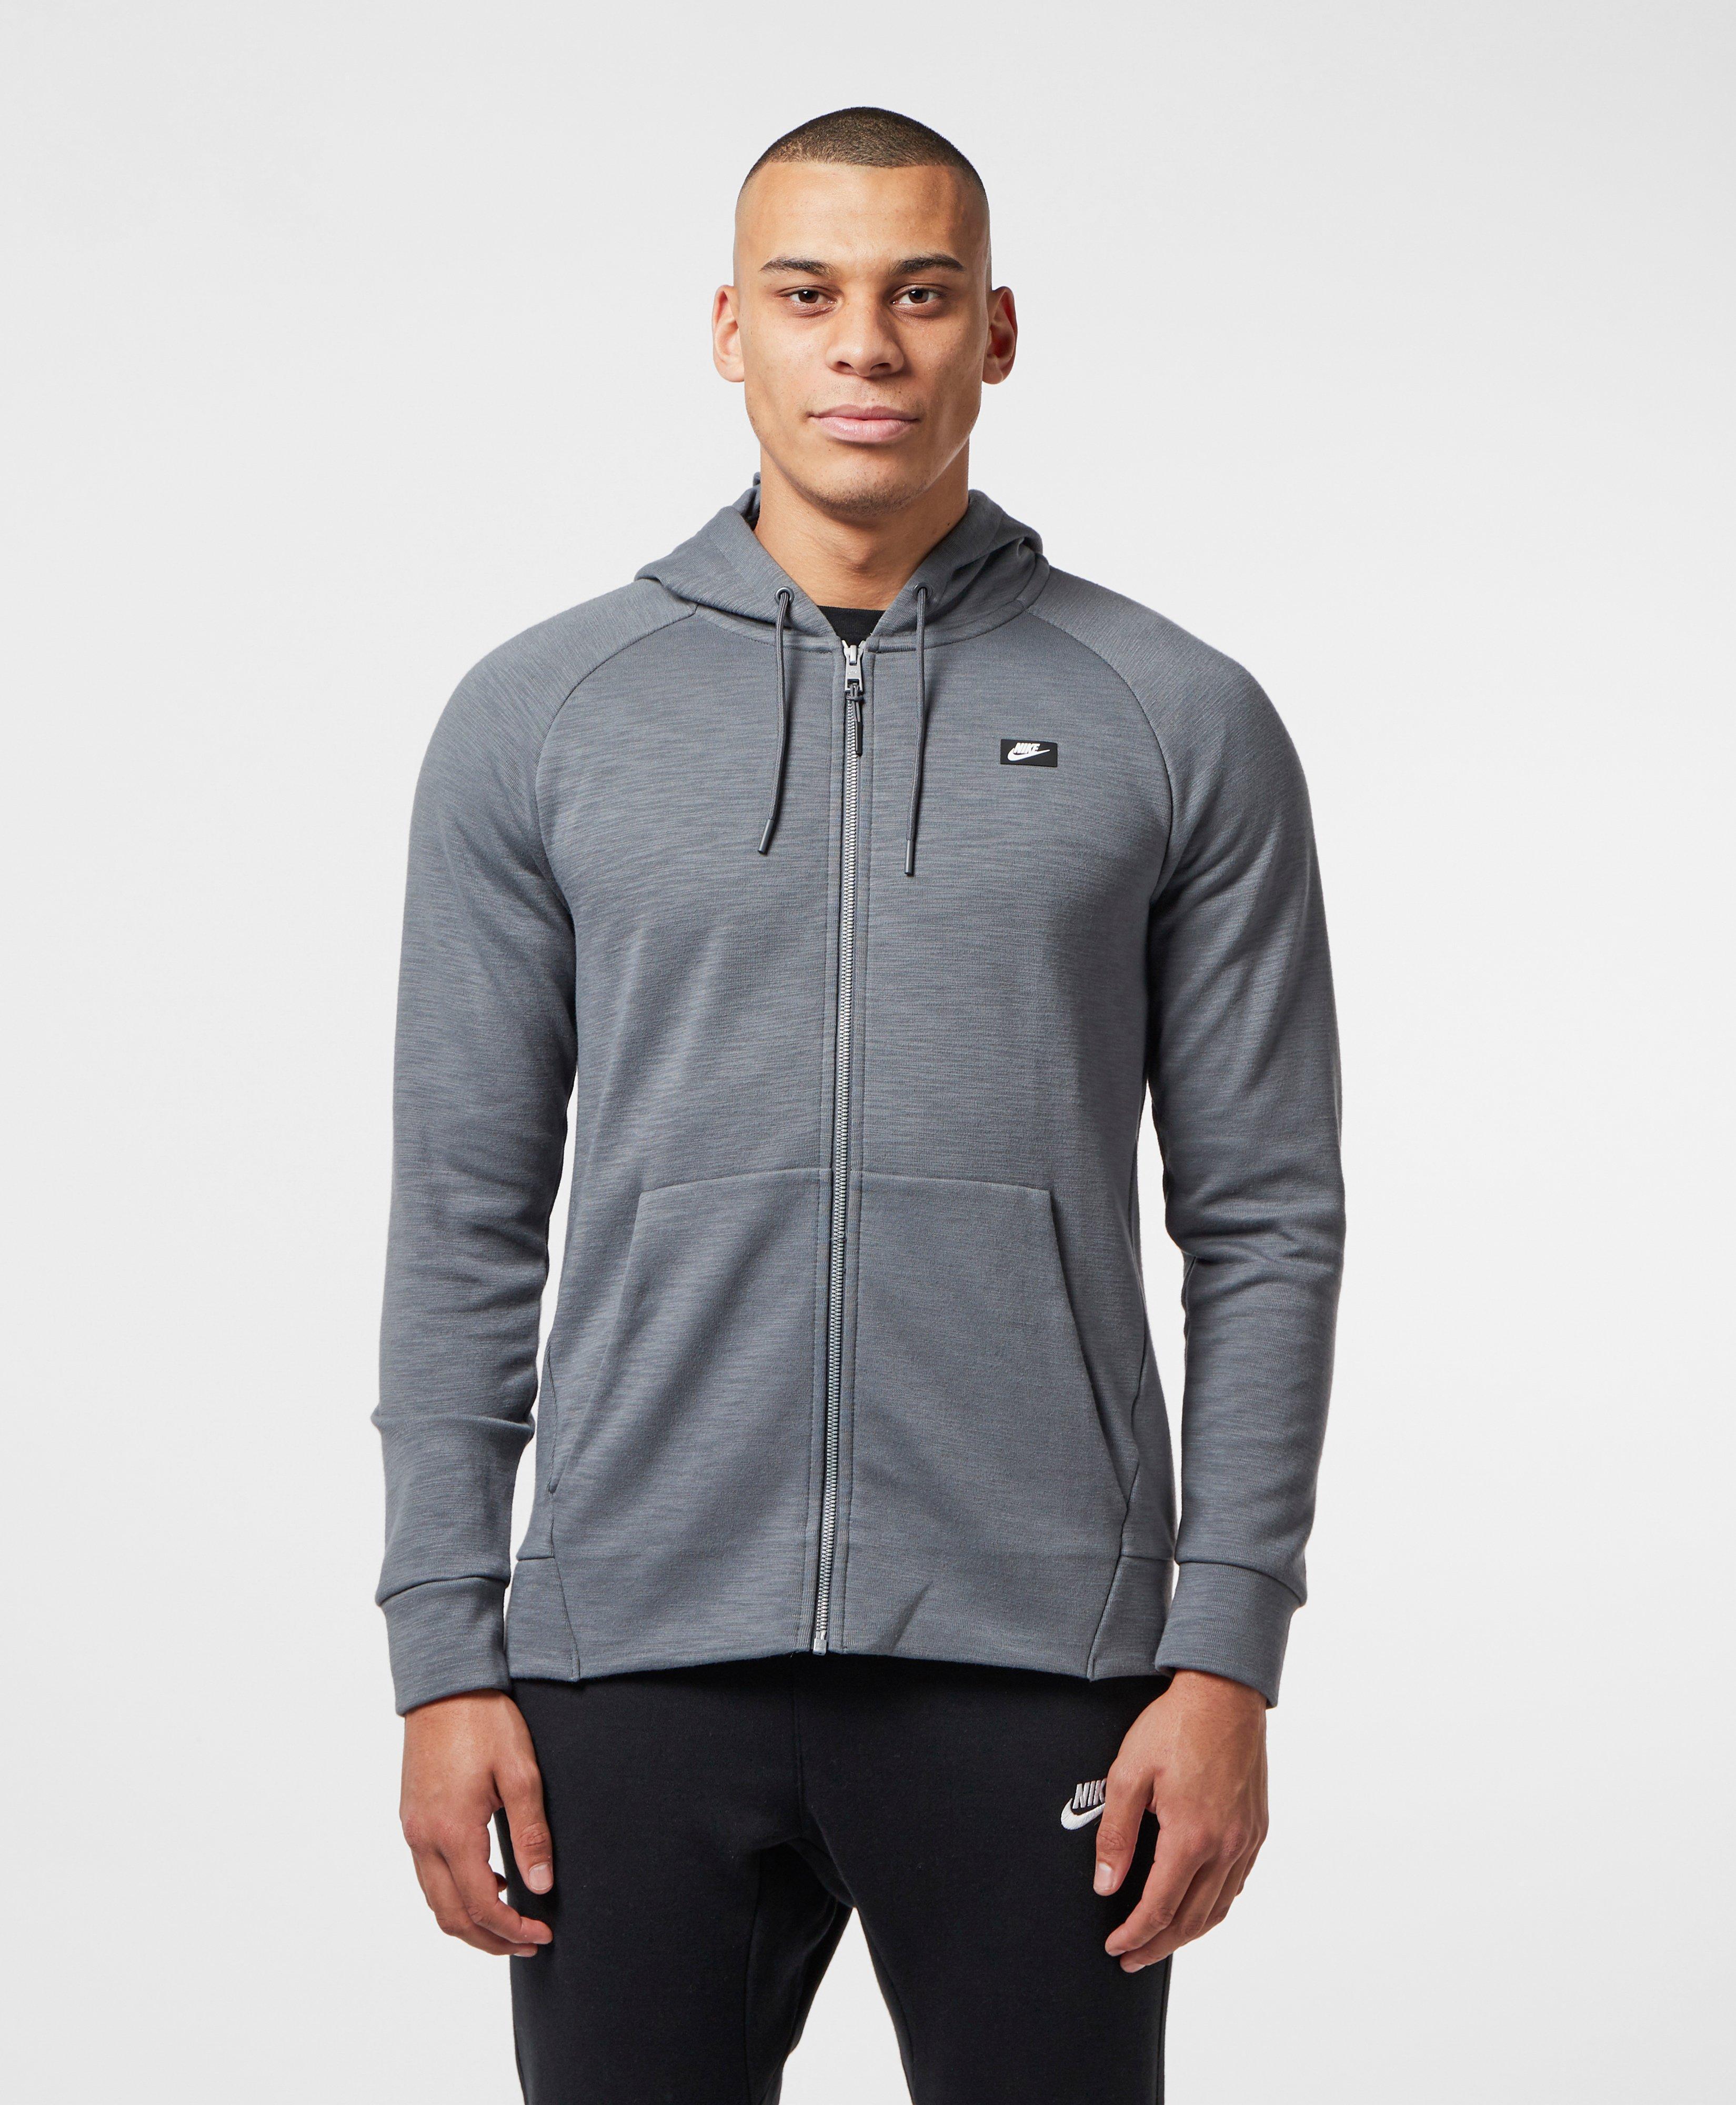 2f38ff6b Nike Optic Full Zip Hoodie in Gray for Men - Lyst